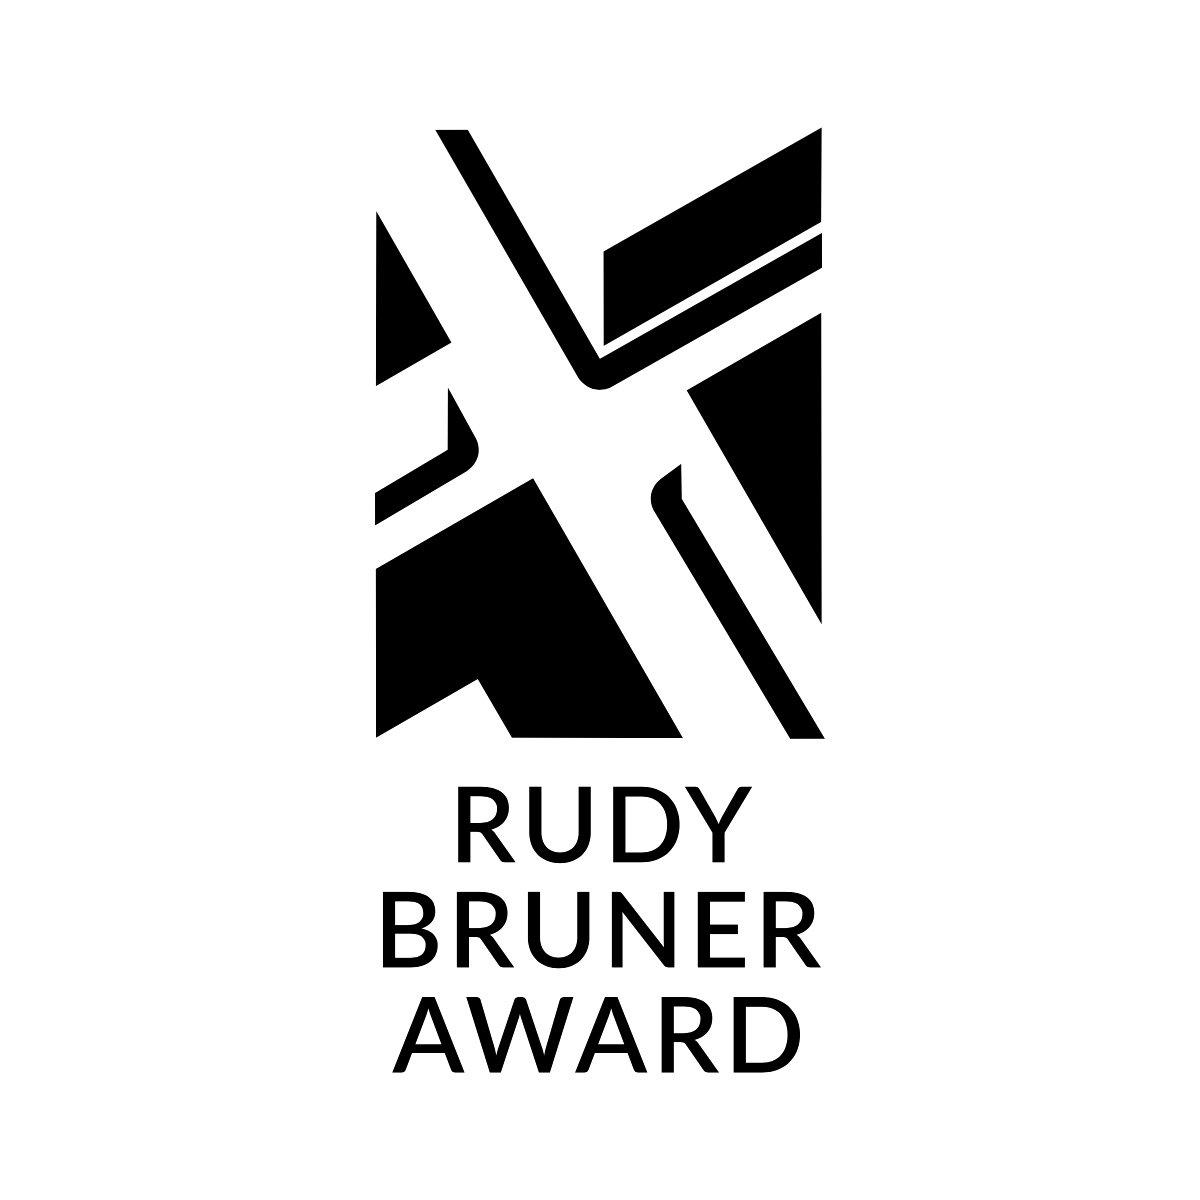 جایزه برونر چیست؟